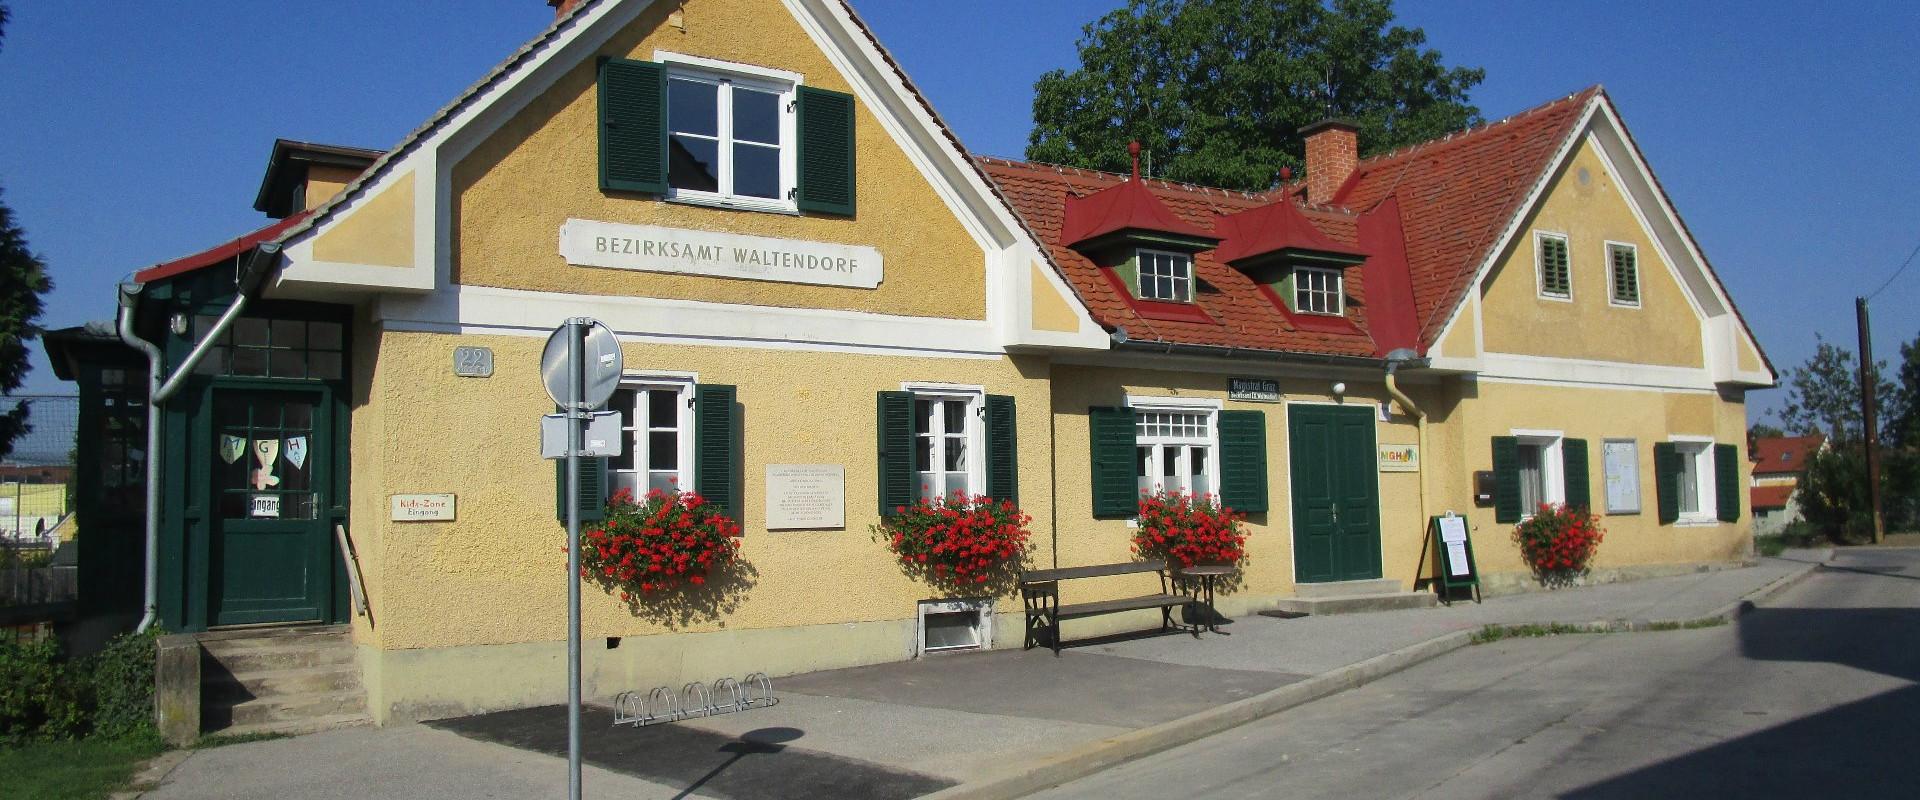 Mai - Mehrgenerationenhaus Waltendorf